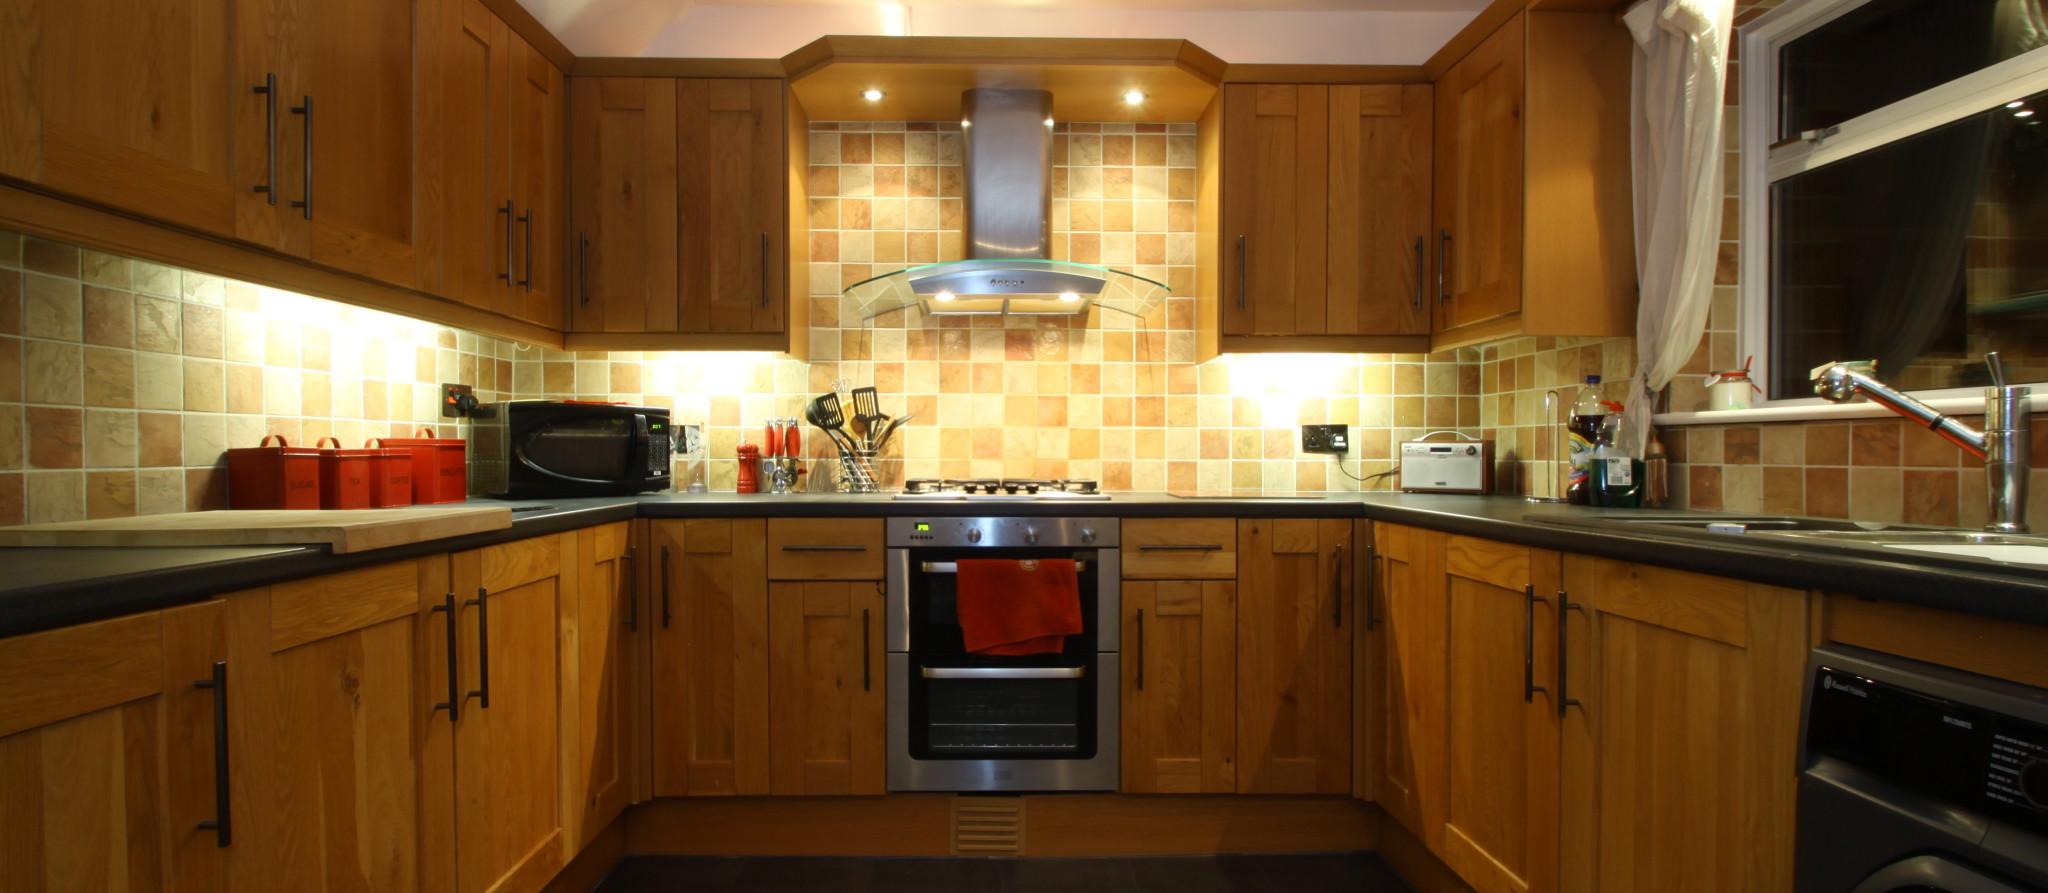 Bespoke farmhouse style kitchen kreative interior for Kitchen designs 3m x 4m